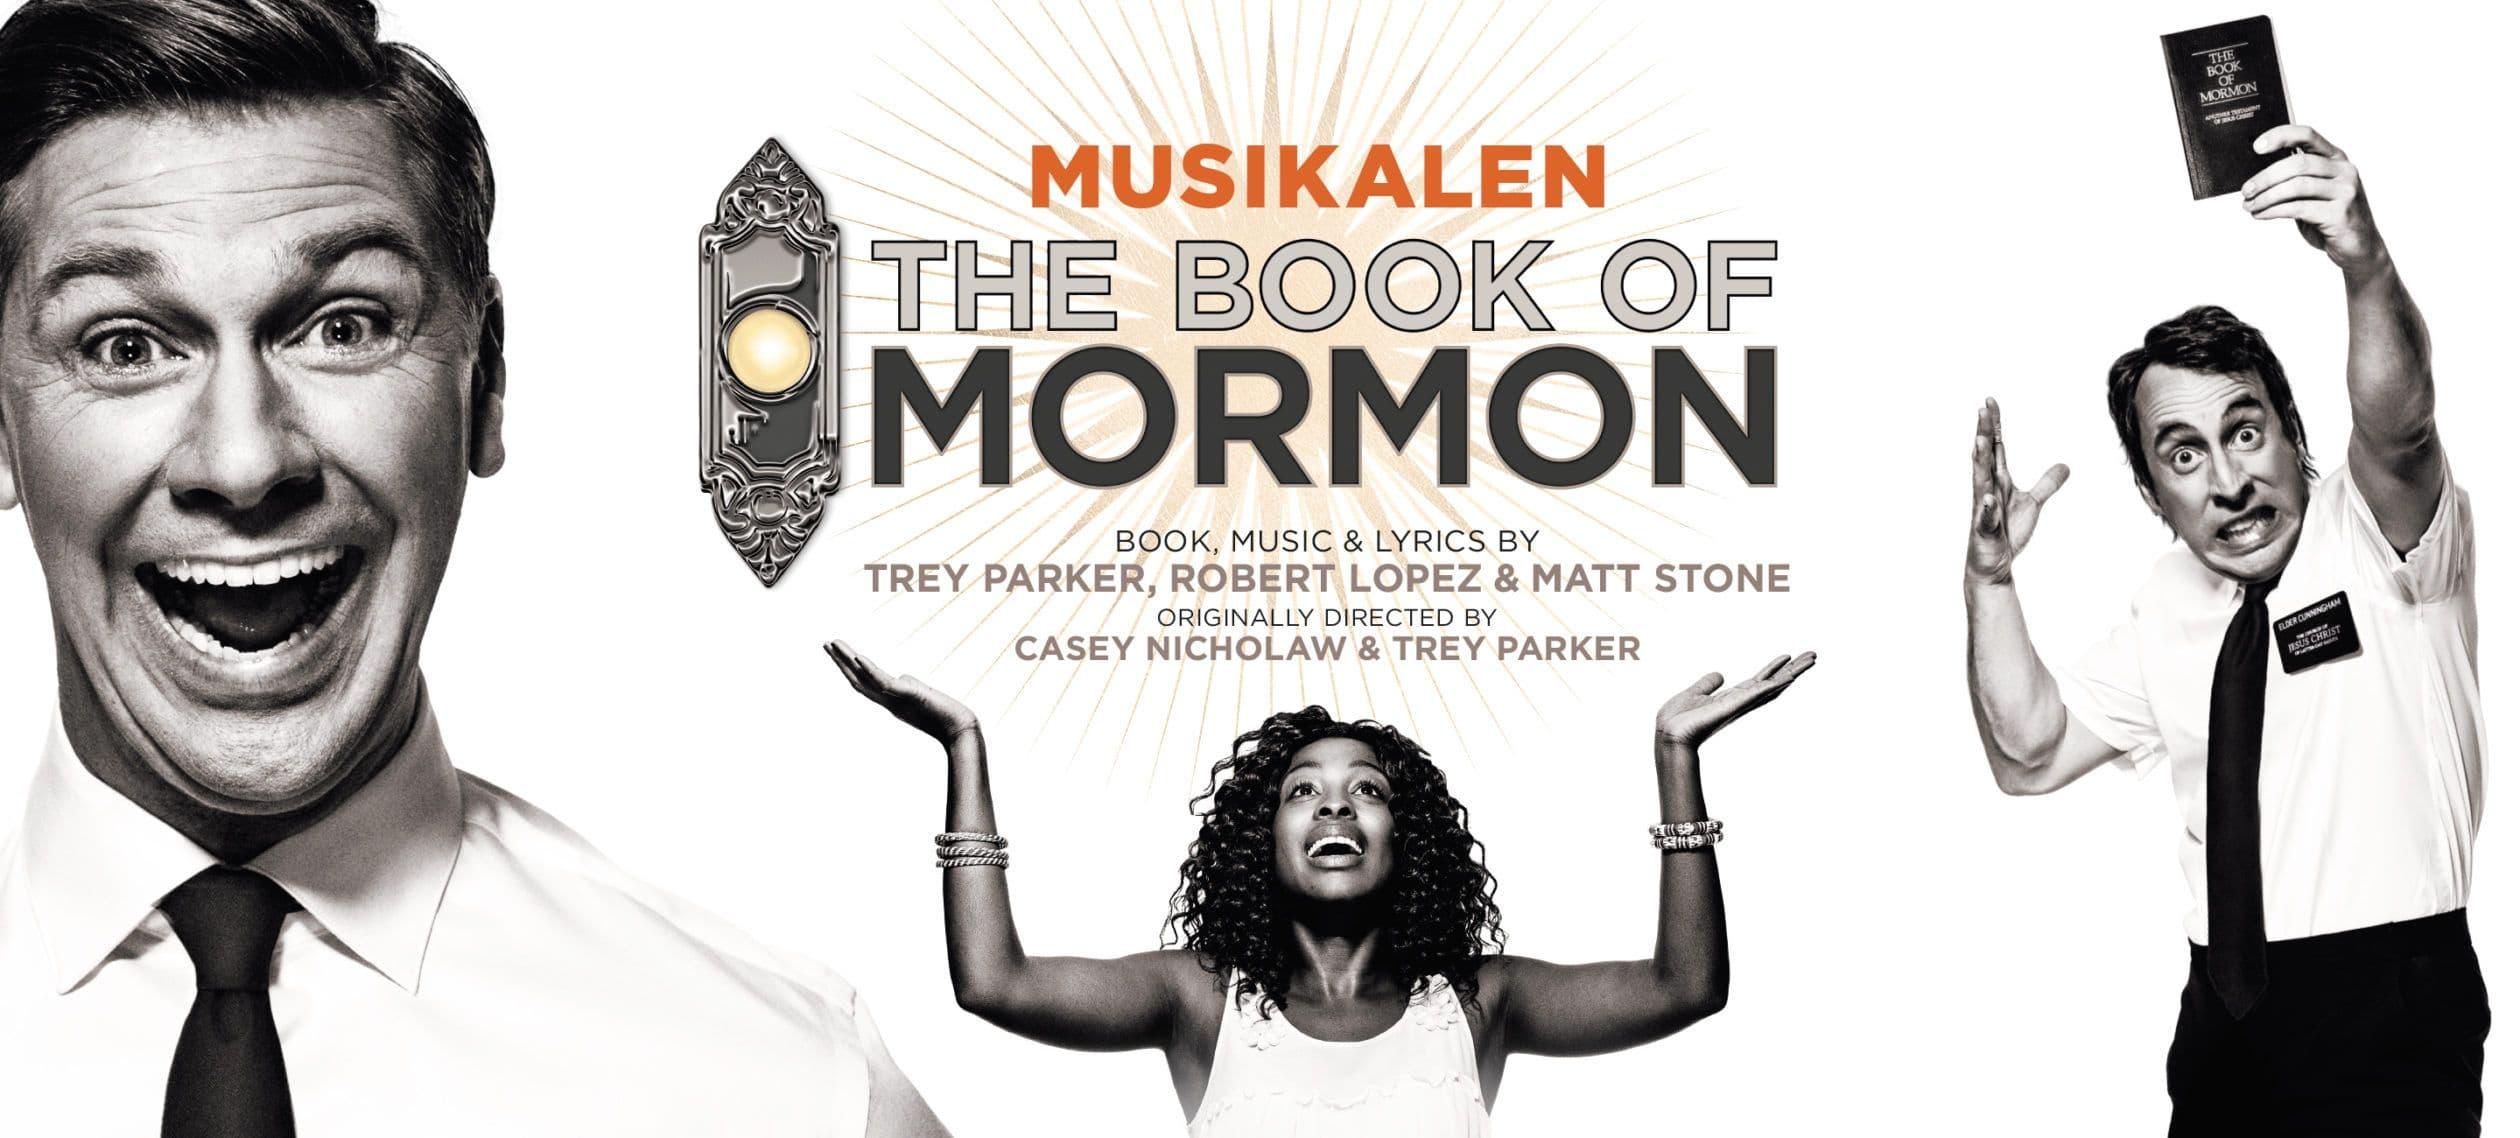 karta chinateatern Musikalsuccén The Book of Mormon på China Teatern – Thatsup karta chinateatern